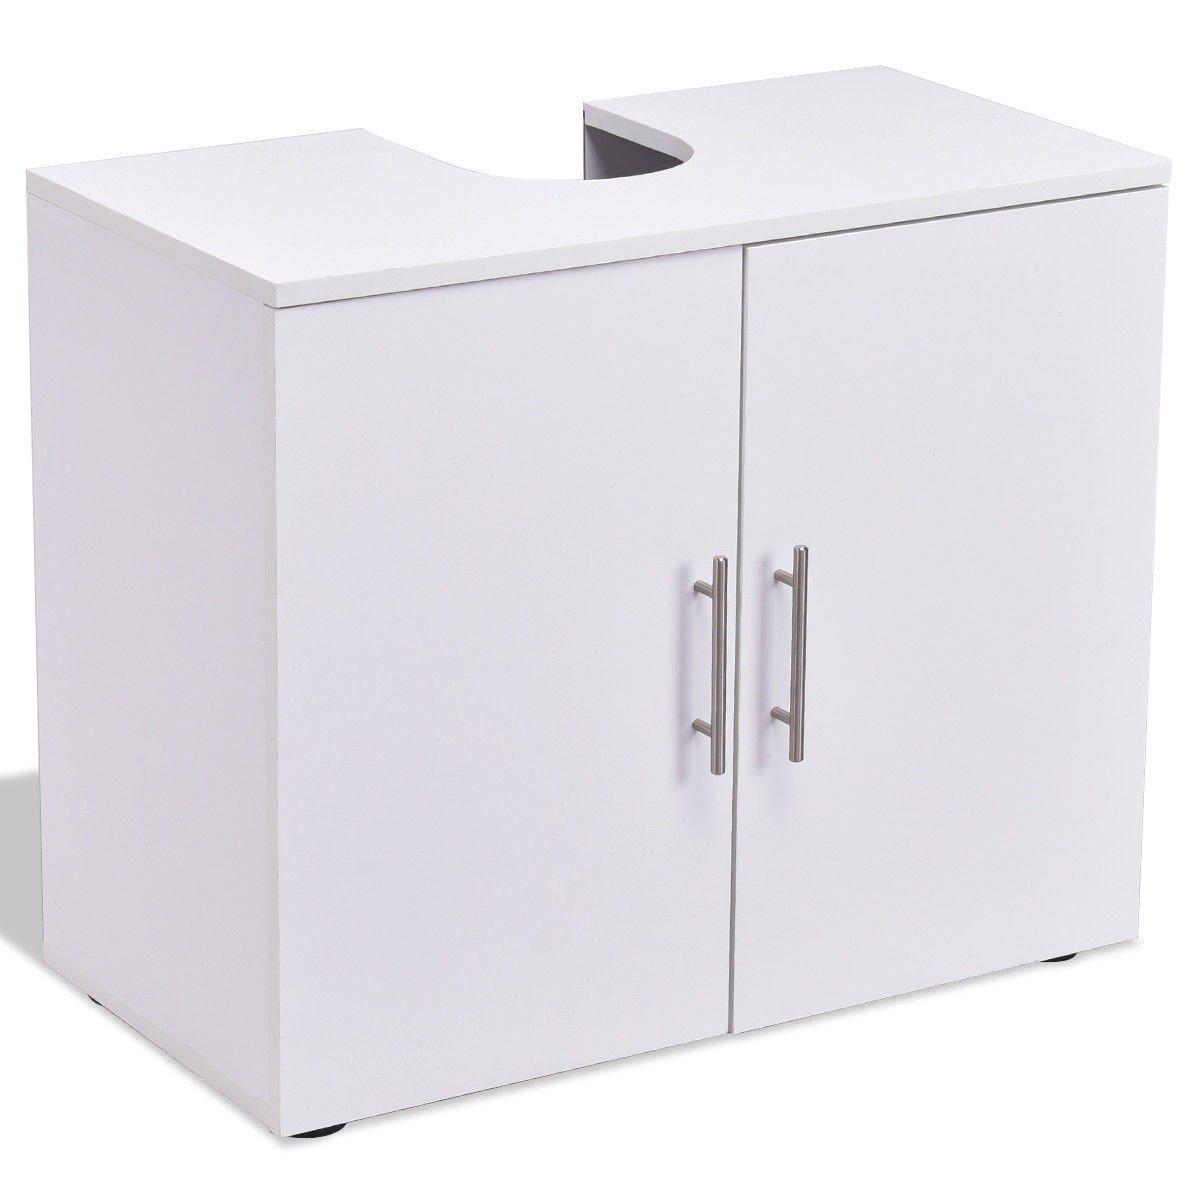 Storage Vanity Cabinet Bathroom Non Pedestal Under Sink Wall Mounted White Wood Furniture MD Group